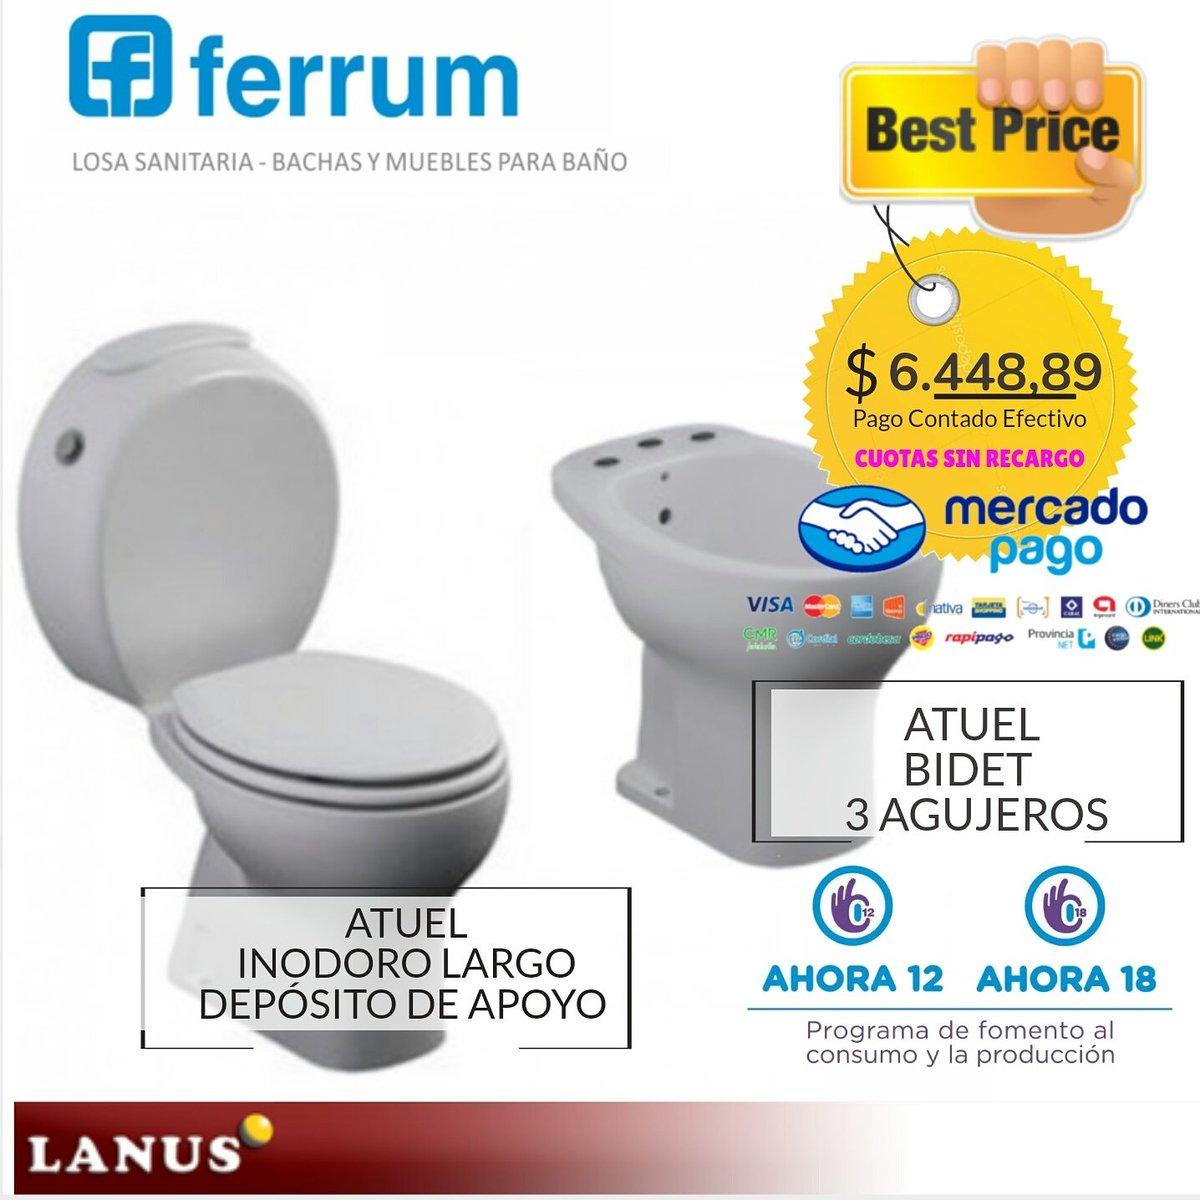 Ferrumatuel Hashtag On Twitter # Muebles Para Toilet